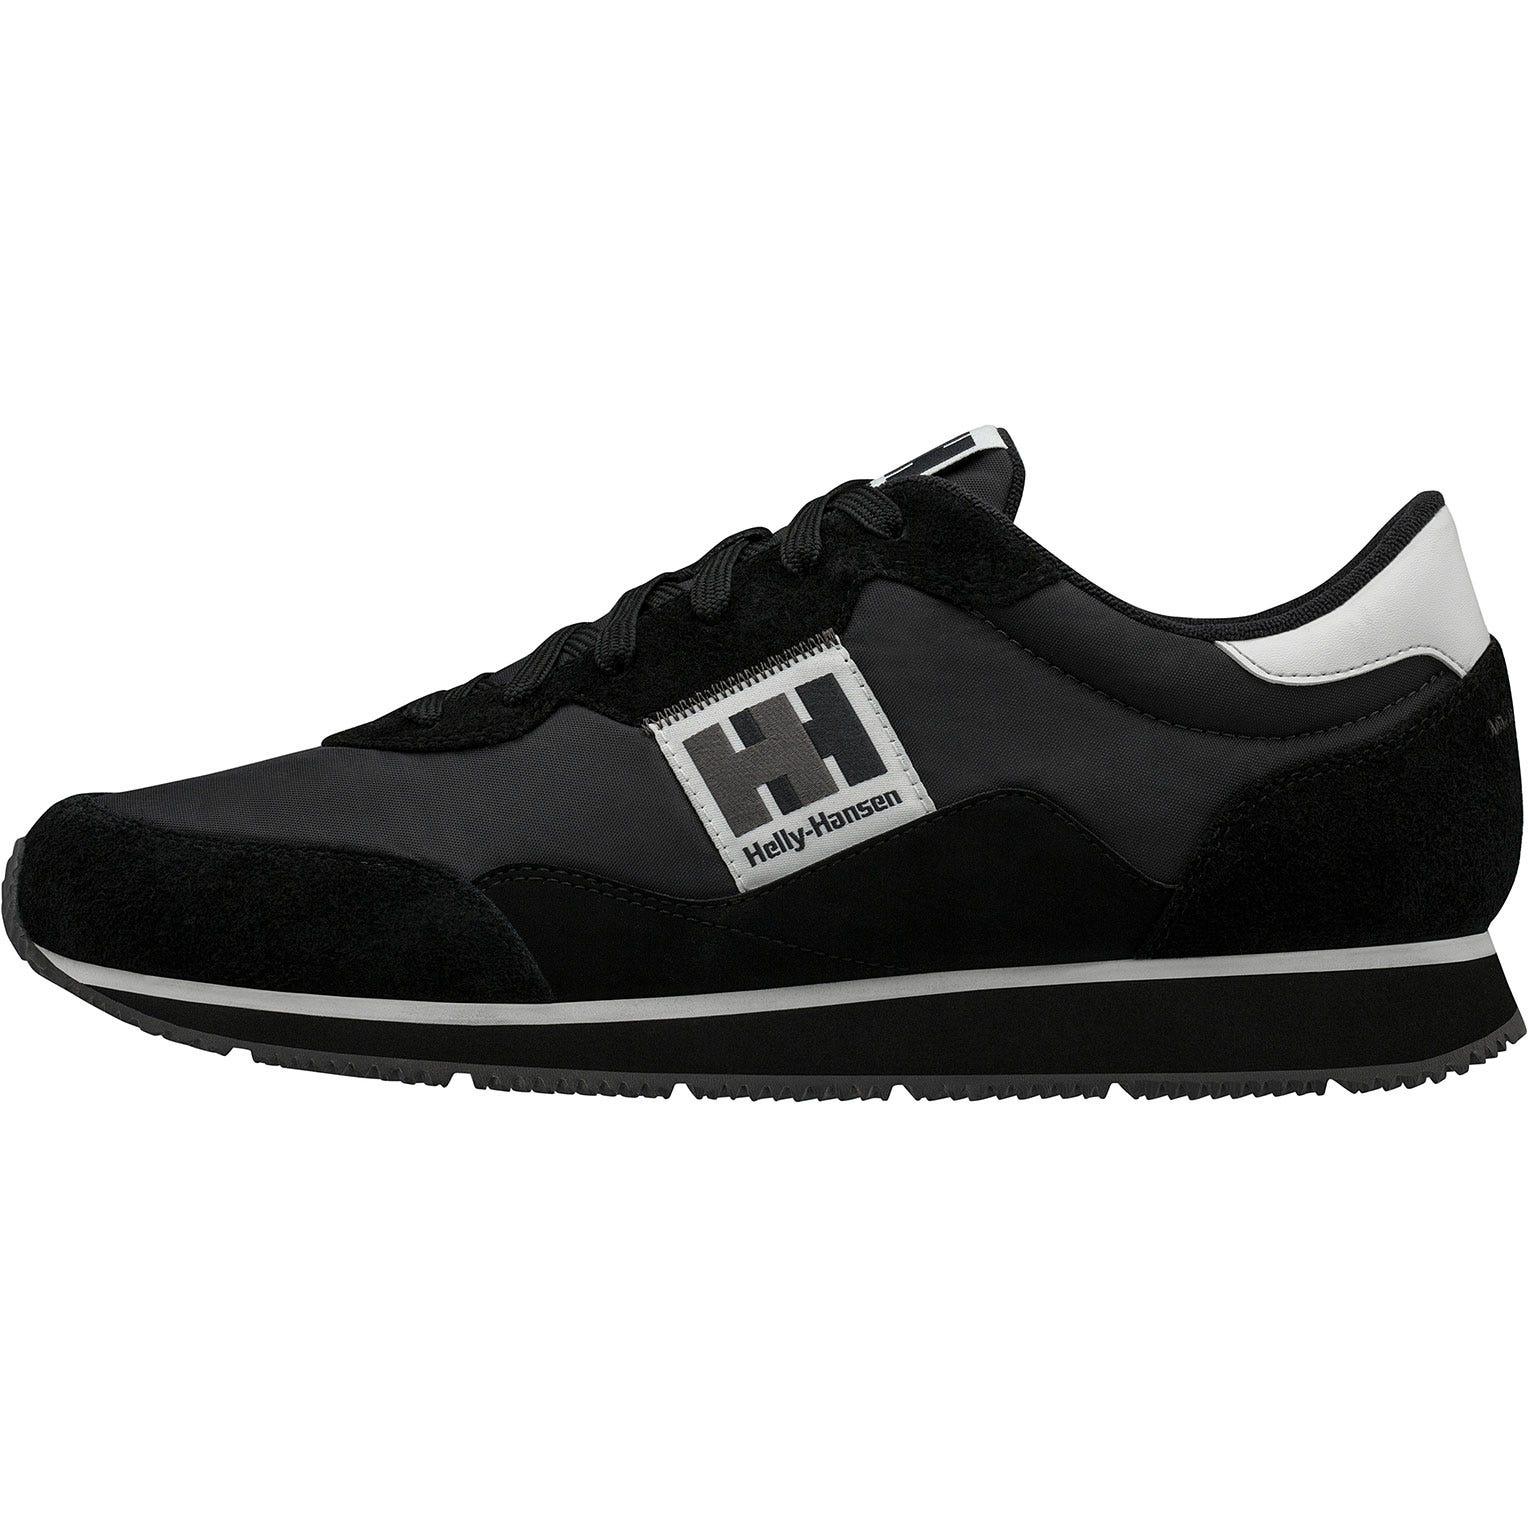 Helly Hansen Ripples Lowcut Sneaker Mens Casual Shoe Black 41/8